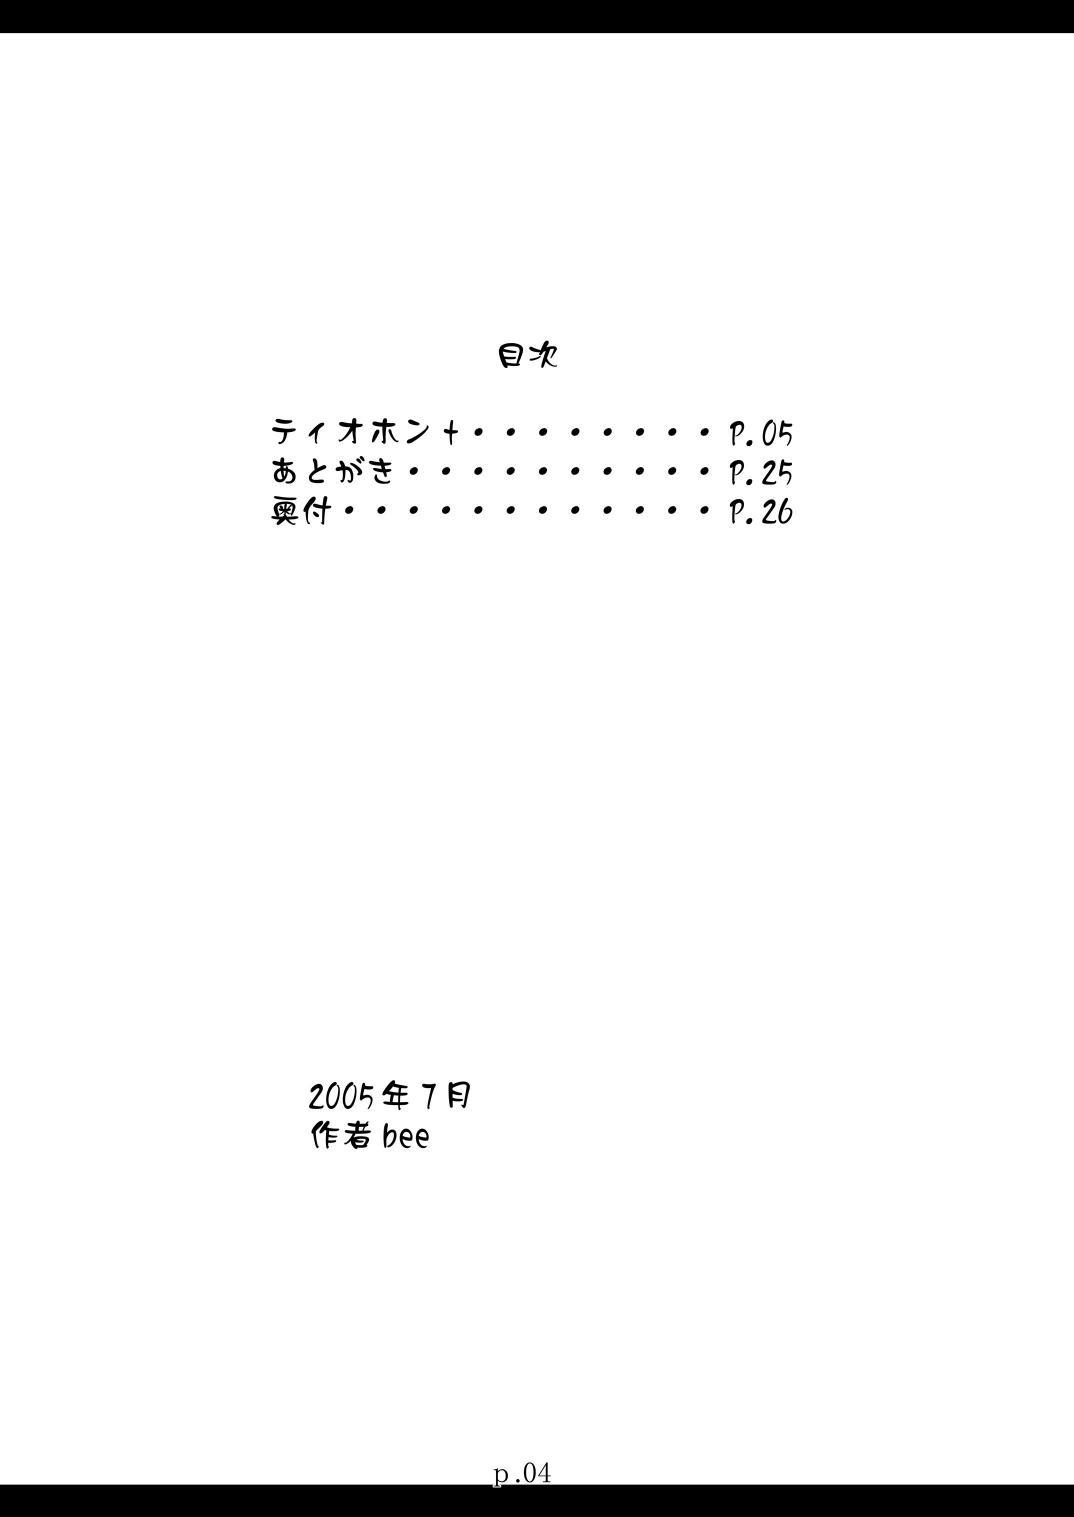 [gyara cter (bee)] Tio hon+ (Konjiki no Gash!! [Zatch Bell!]) dl version 3